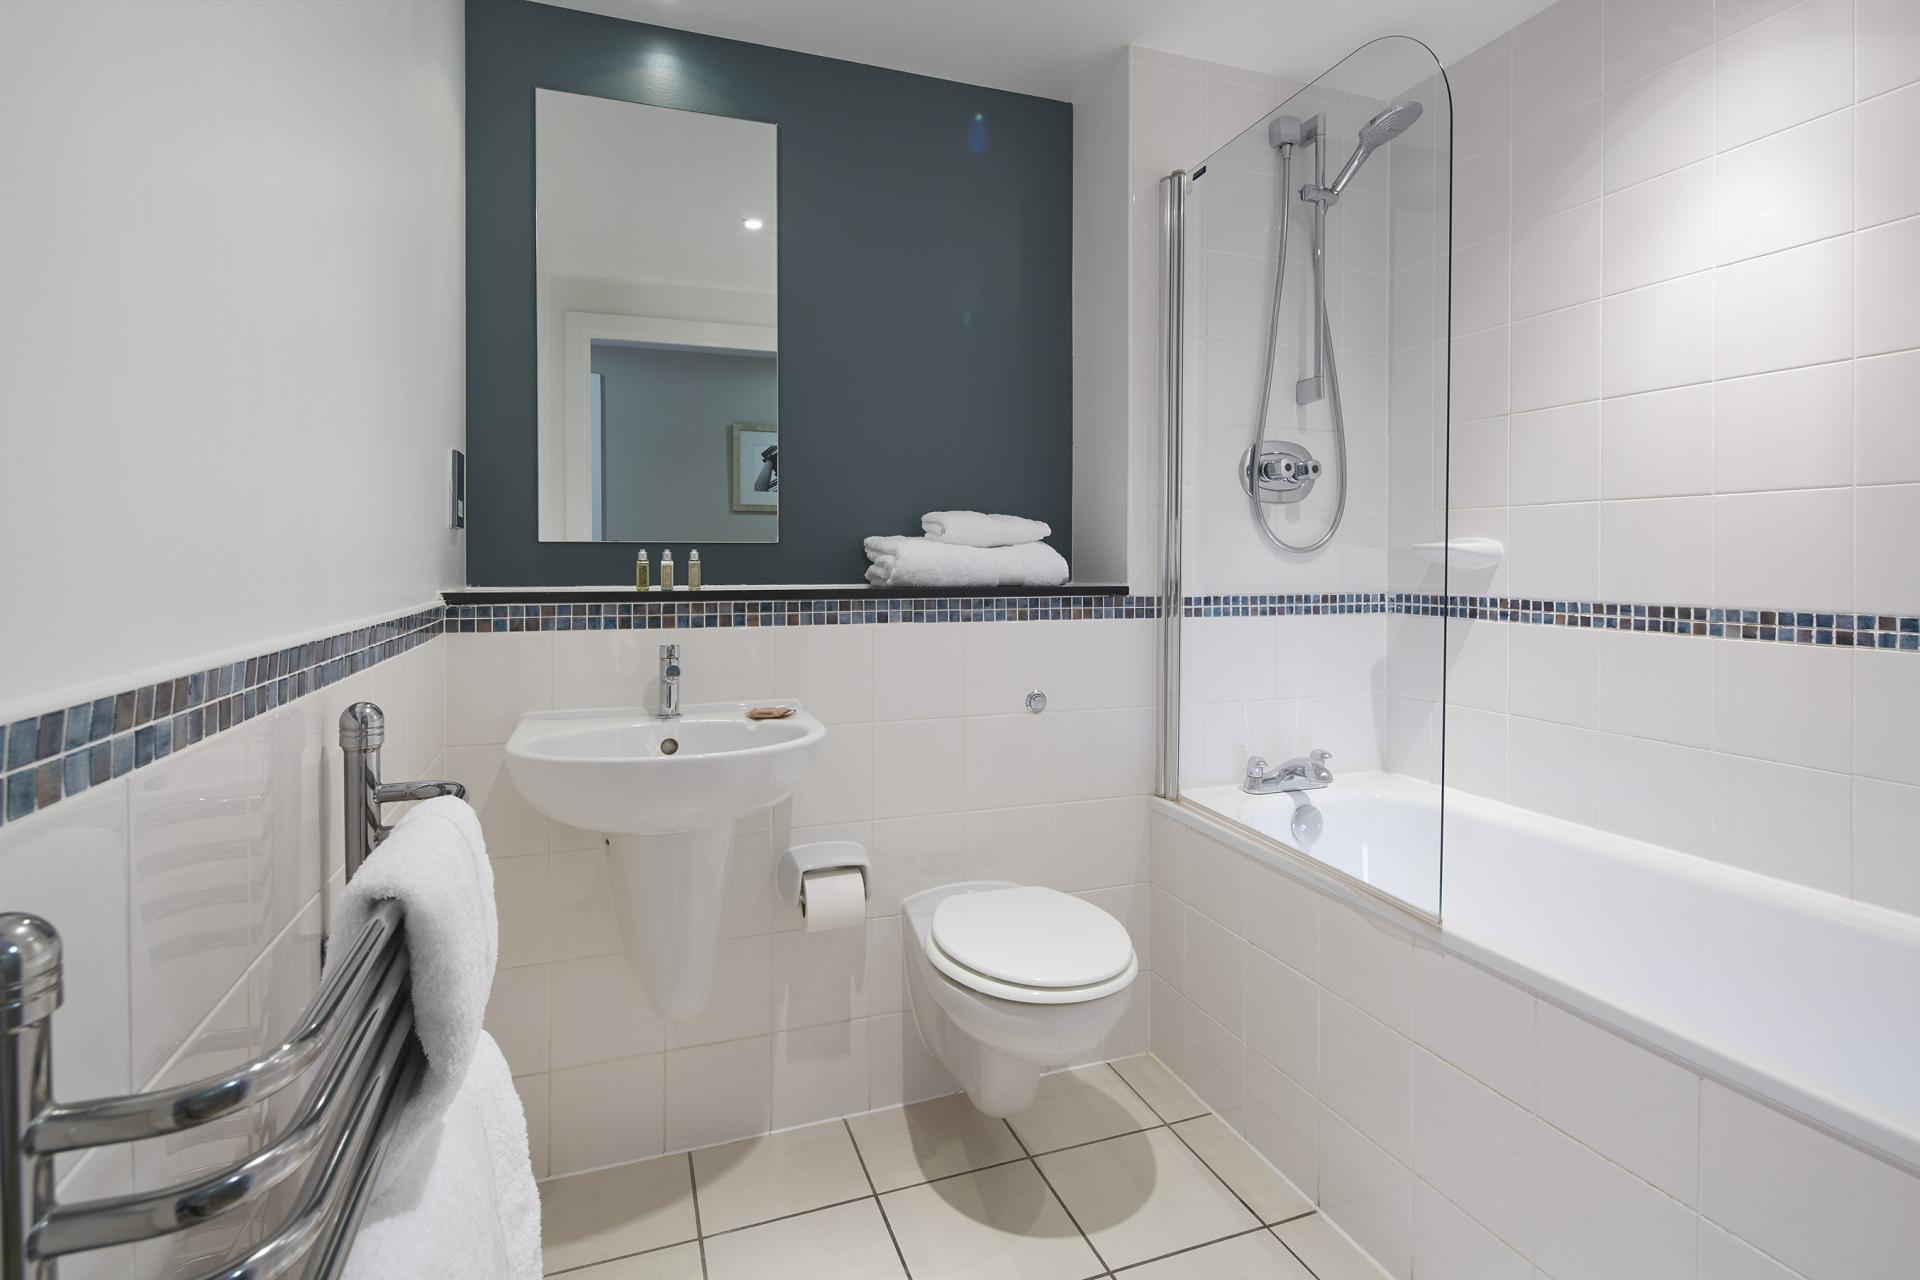 Bathroom at Empire Square Apartments, London Bridge, London - Citybase Apartments